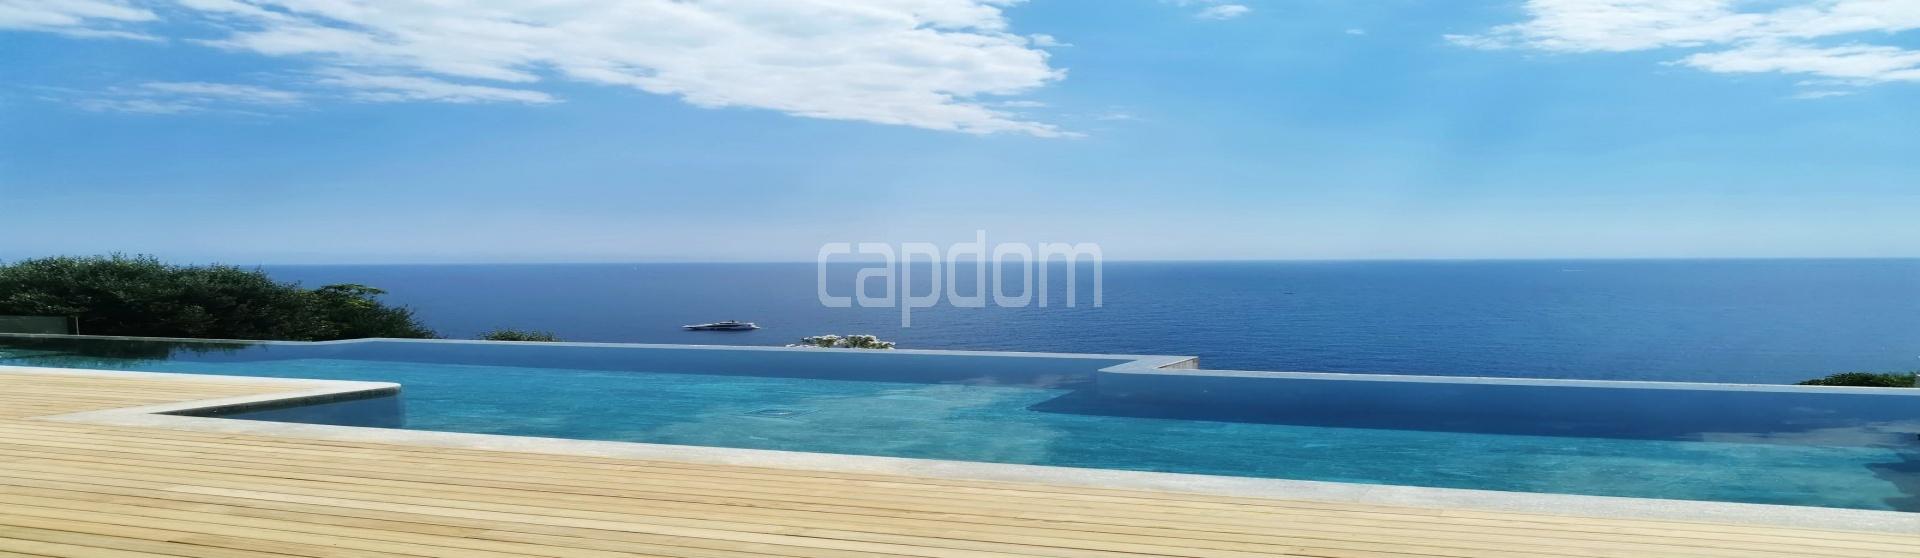 New Waterfront Villa for sale in Roquebrune Cap-Martin - Wiew over mediterranean sea